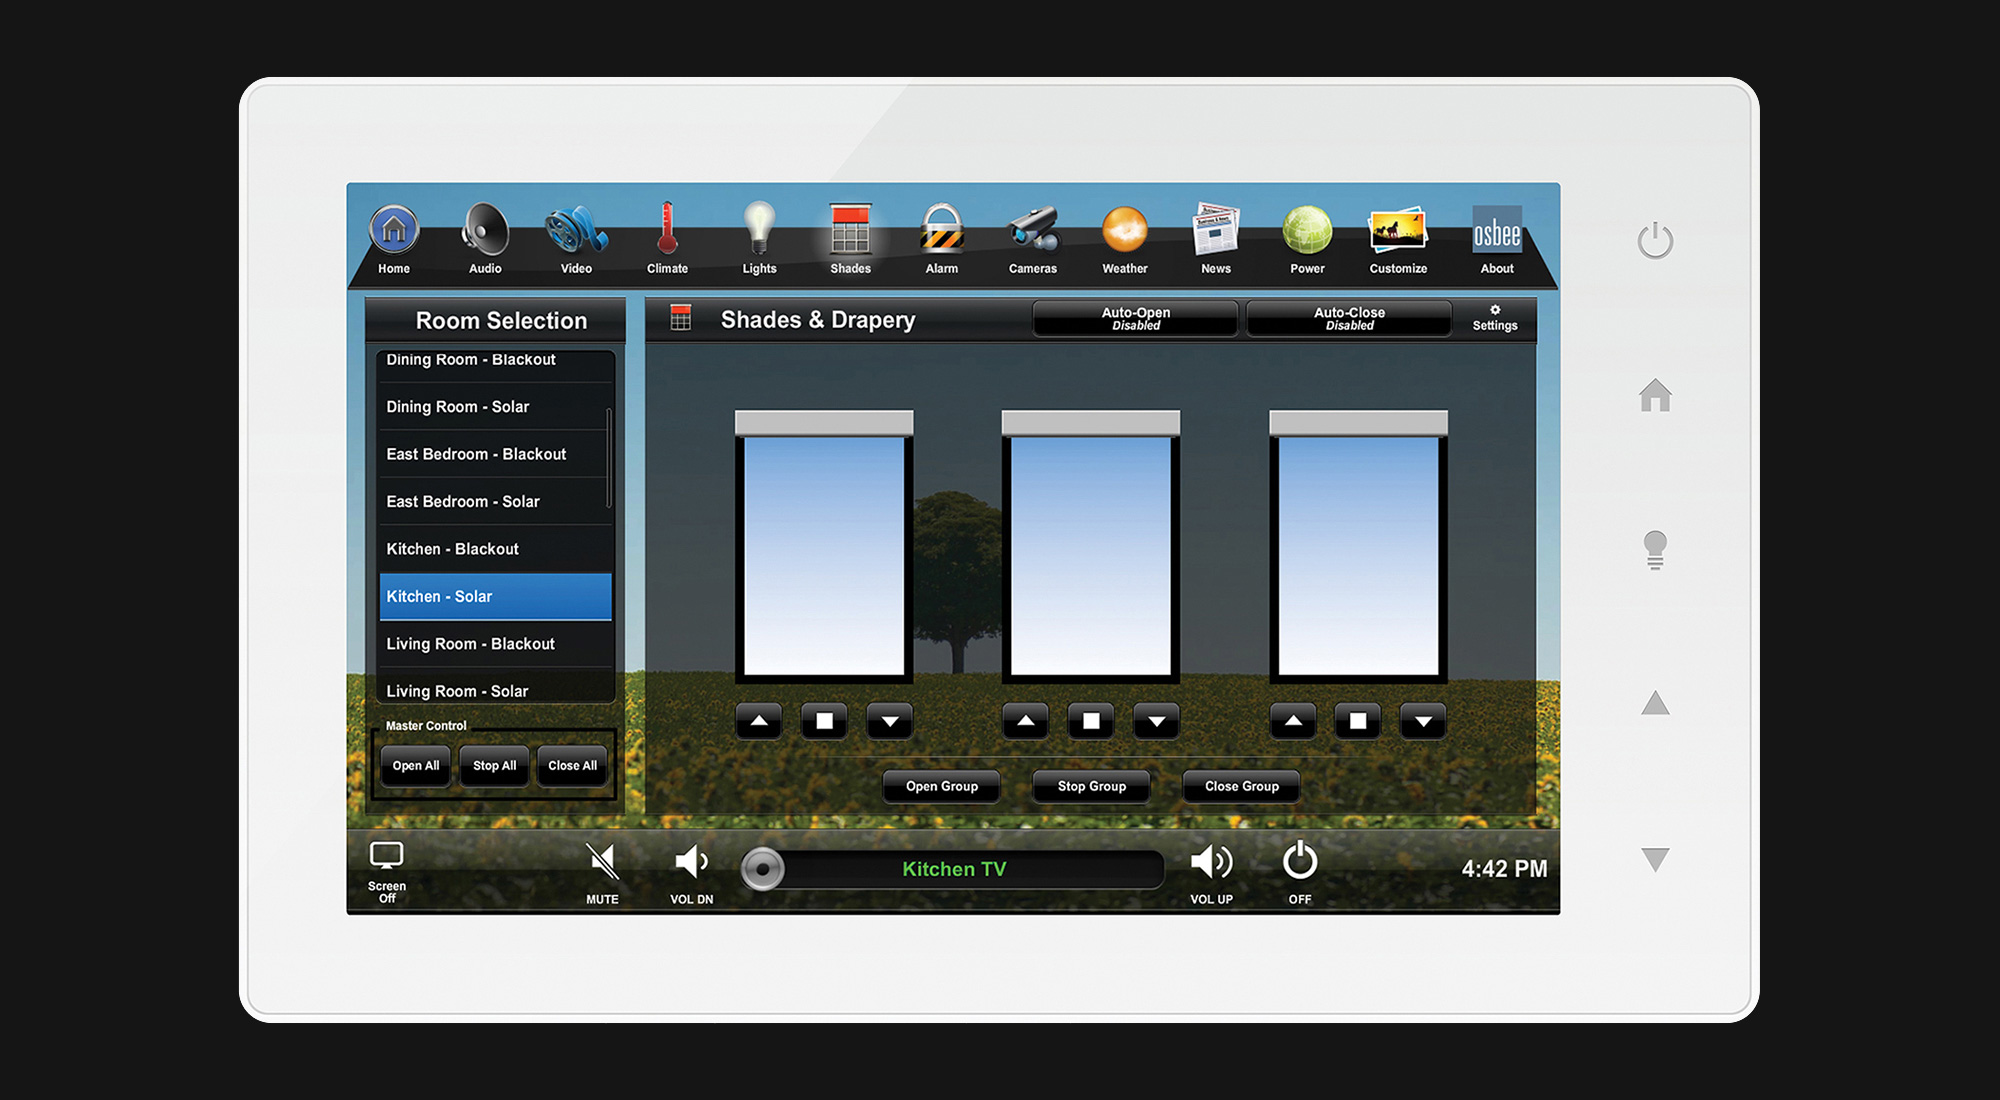 touchscreen, shades screen